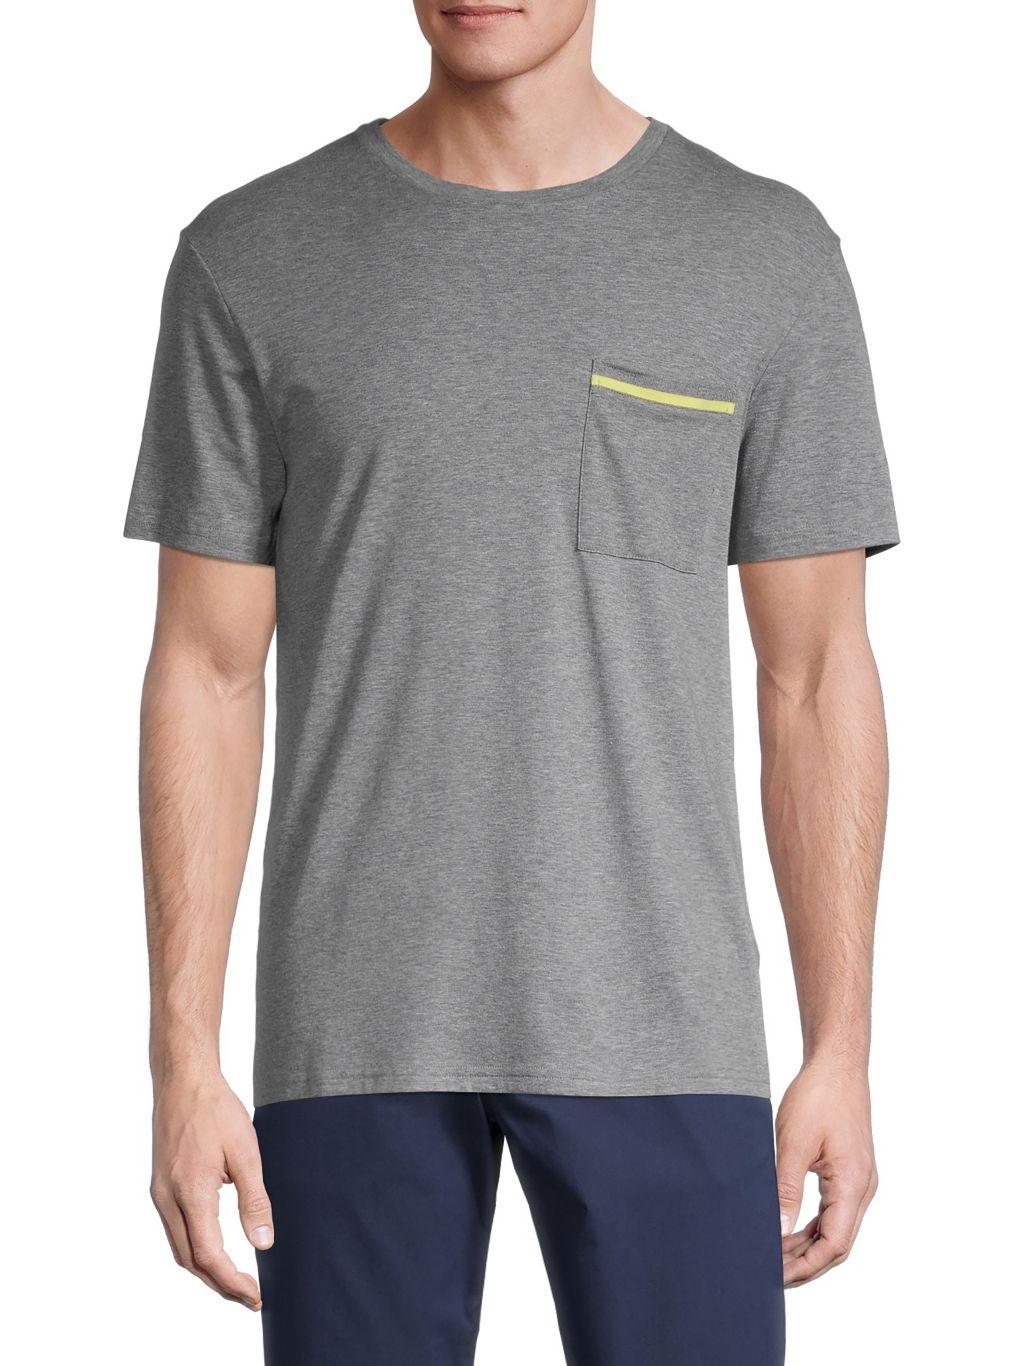 Theory Striped Pocket T-Shirt